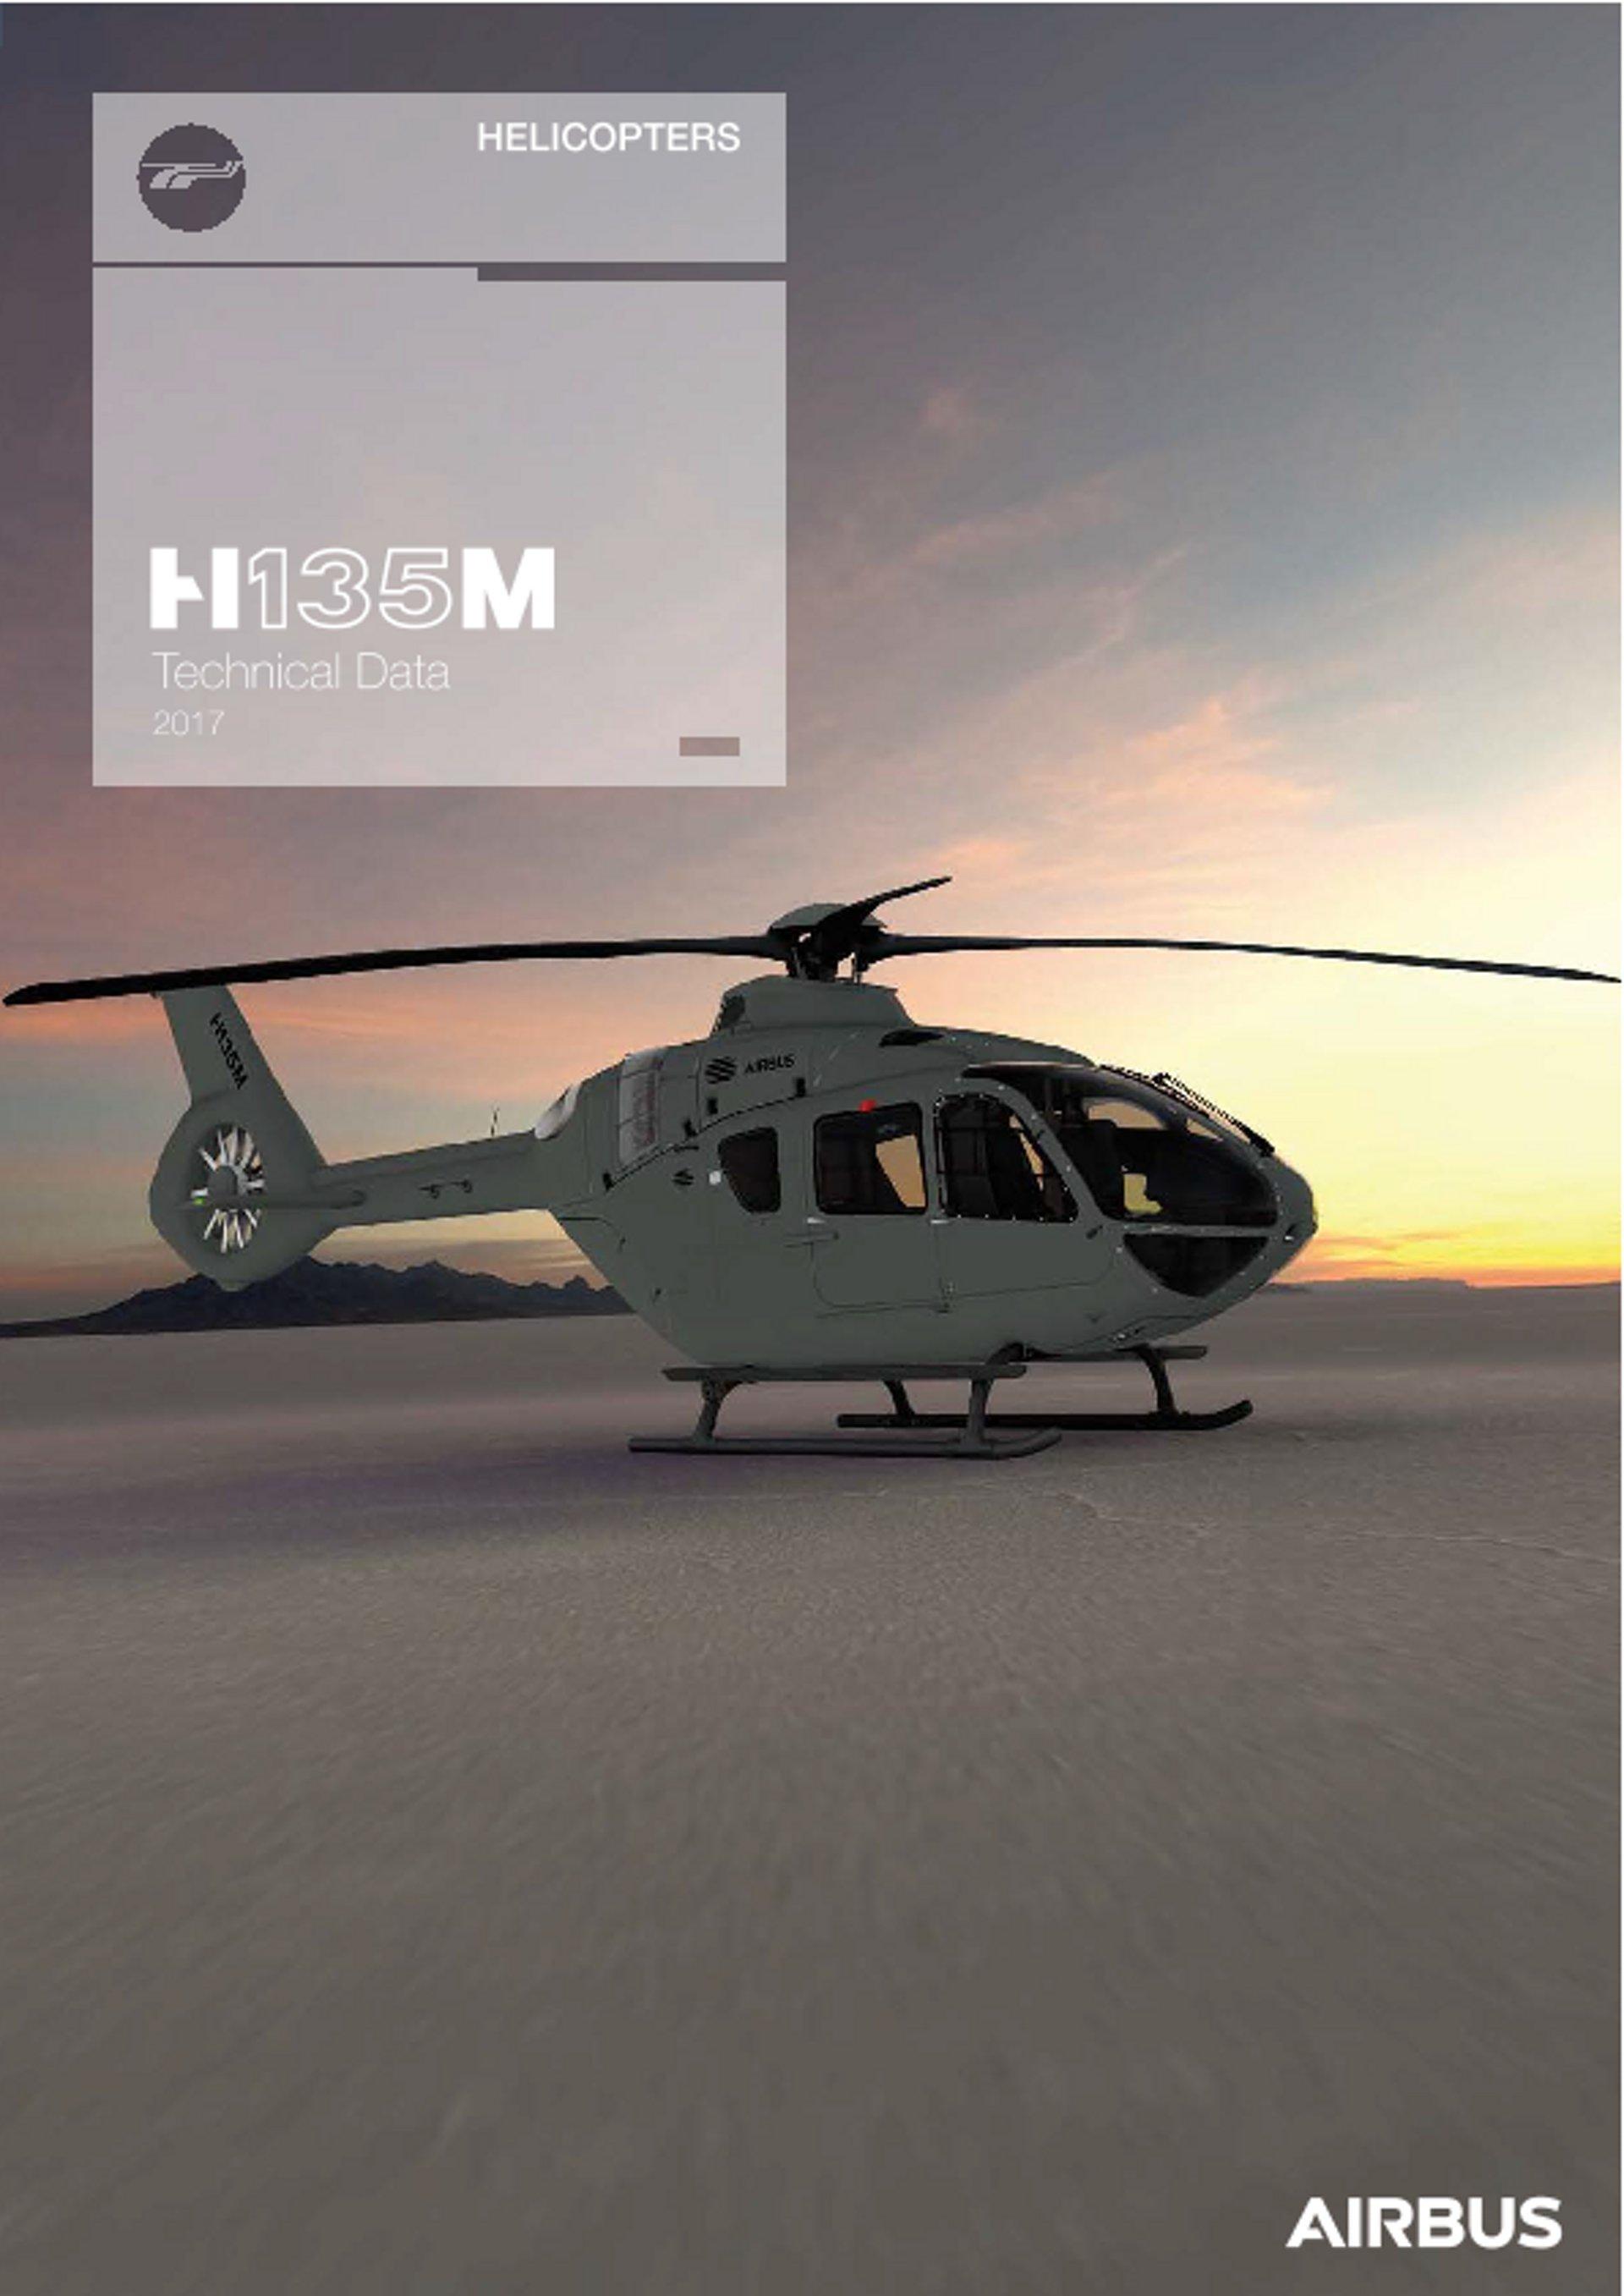 H135M Technical Data